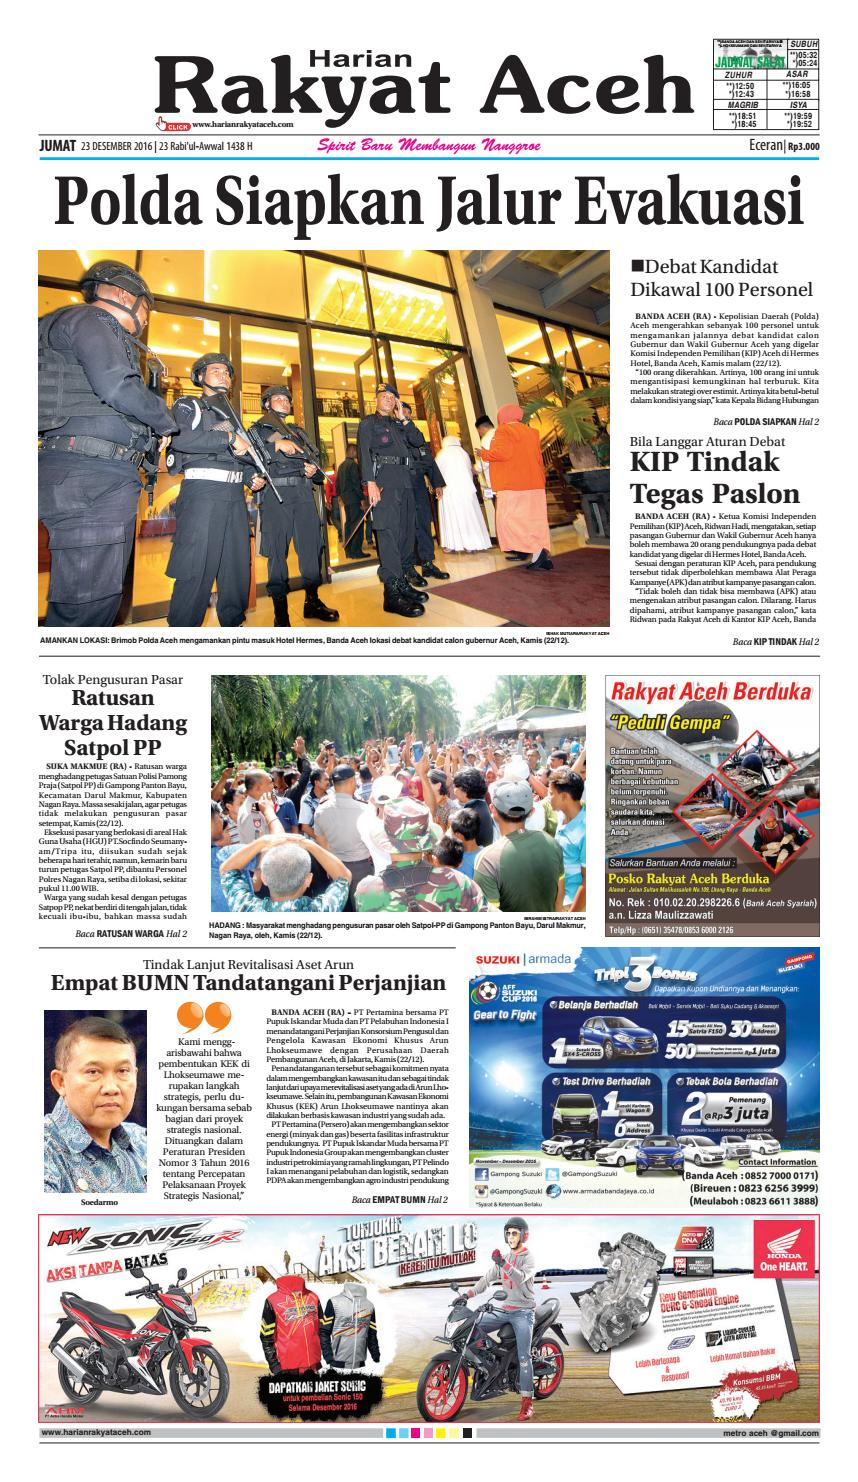 23 Decemberr 2016 By E Rakyat Aceh Issuu Produk Ukm Bumn Batik Tulis Warna Alam Ra Ampamp